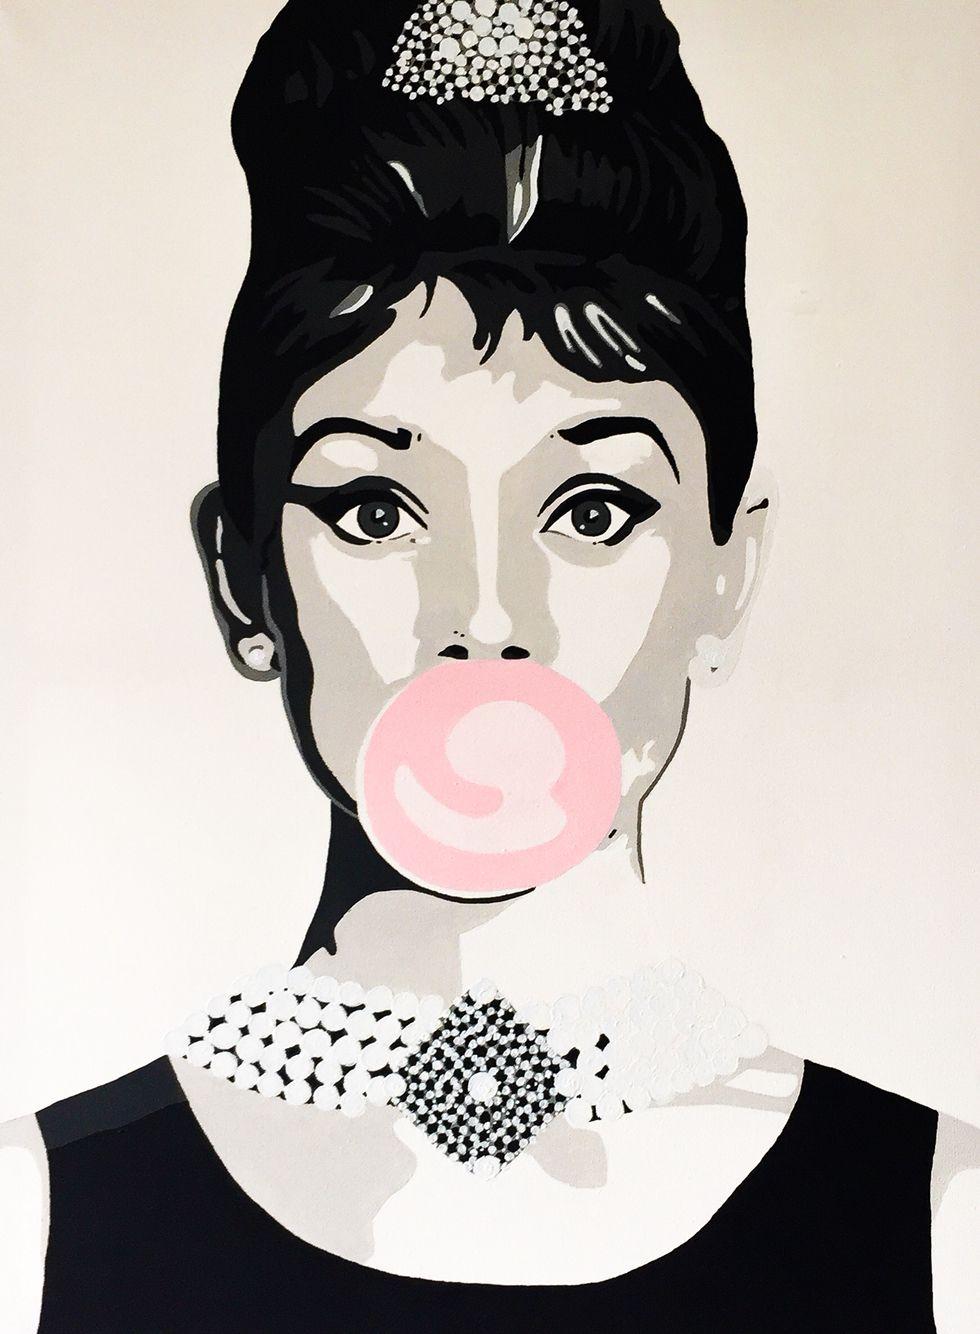 Audrey Hepburn Acryl On Canvas Popart Made By Anne Van Iersel Audrey Hepburn Kunst Gemälde Acryl Pop Art